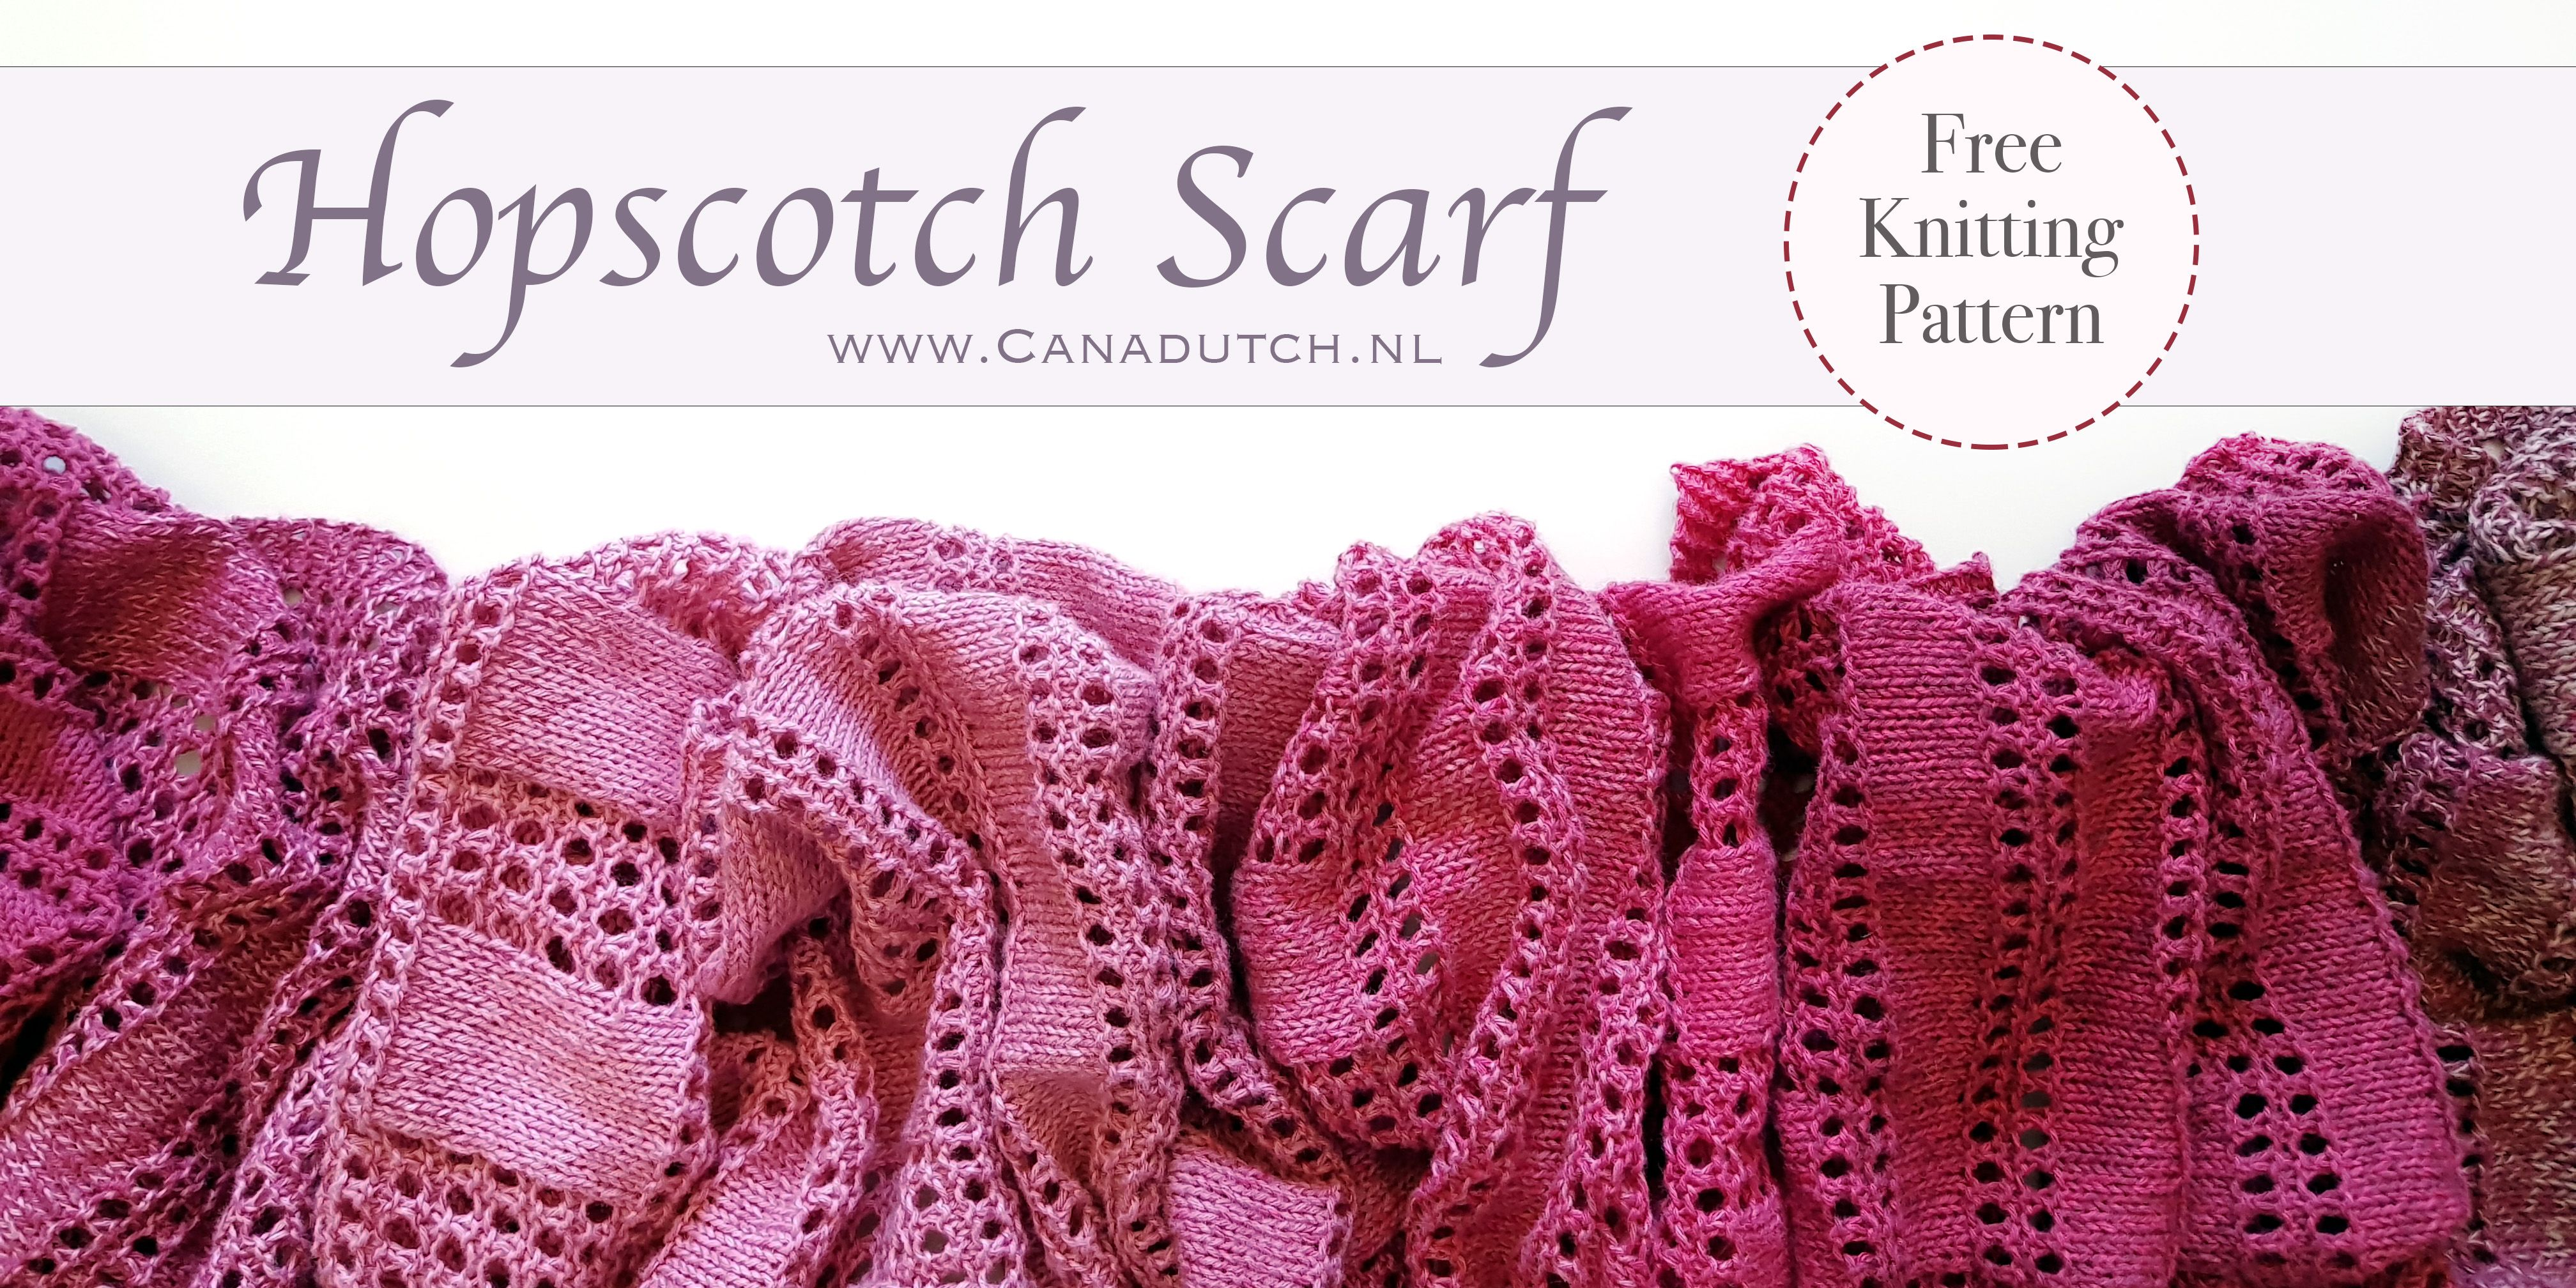 Hopscotch Scarf – Free Knitting Pattern – Canadutch | Knitting ...